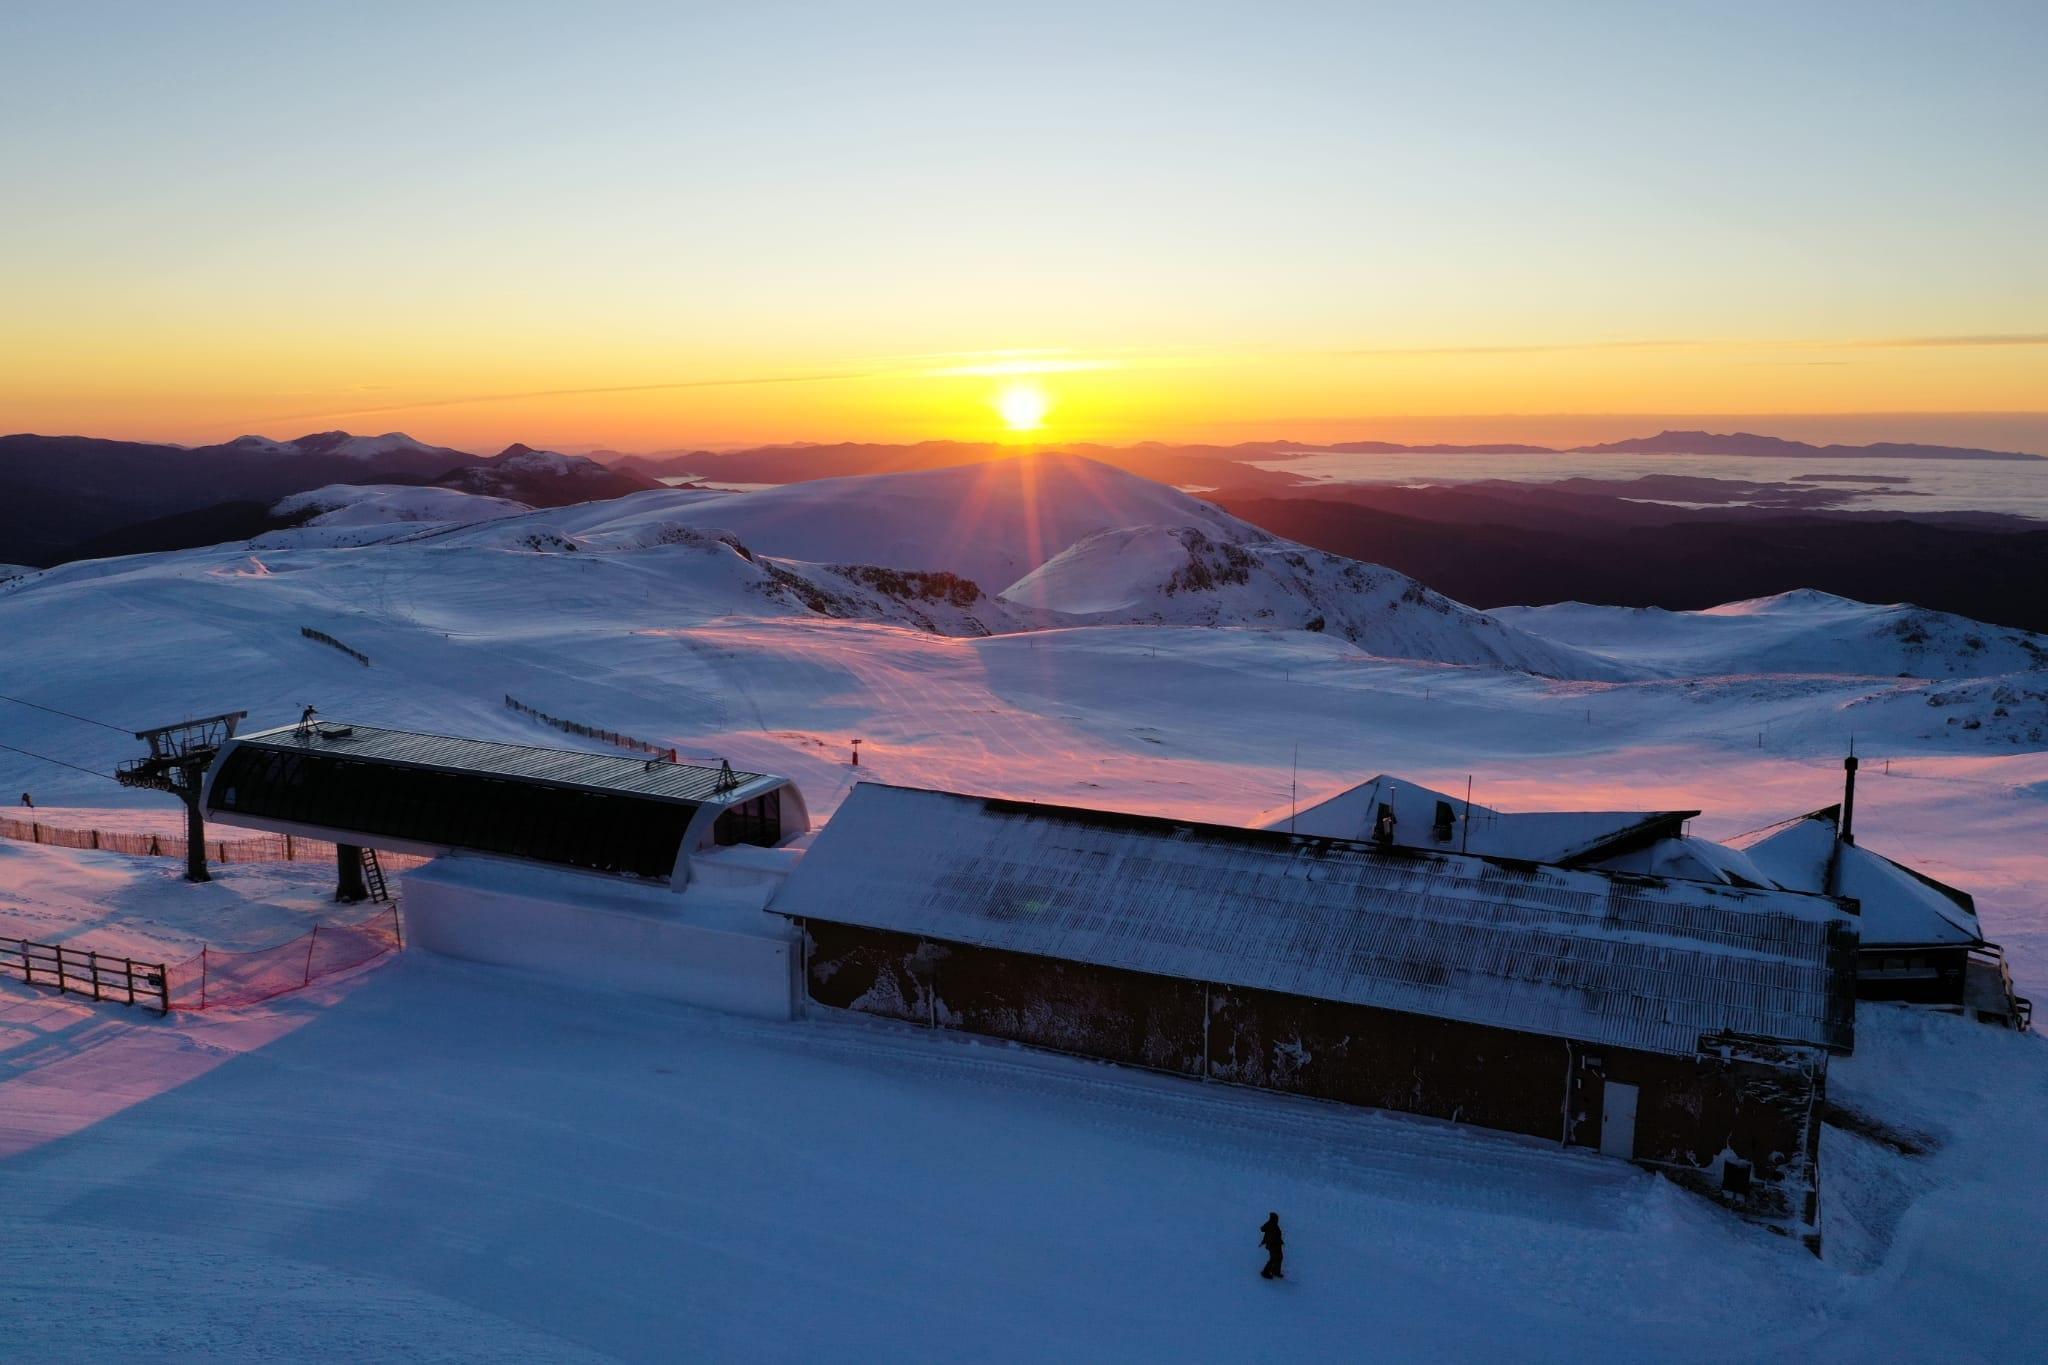 La Molina Reiseführer Skiort